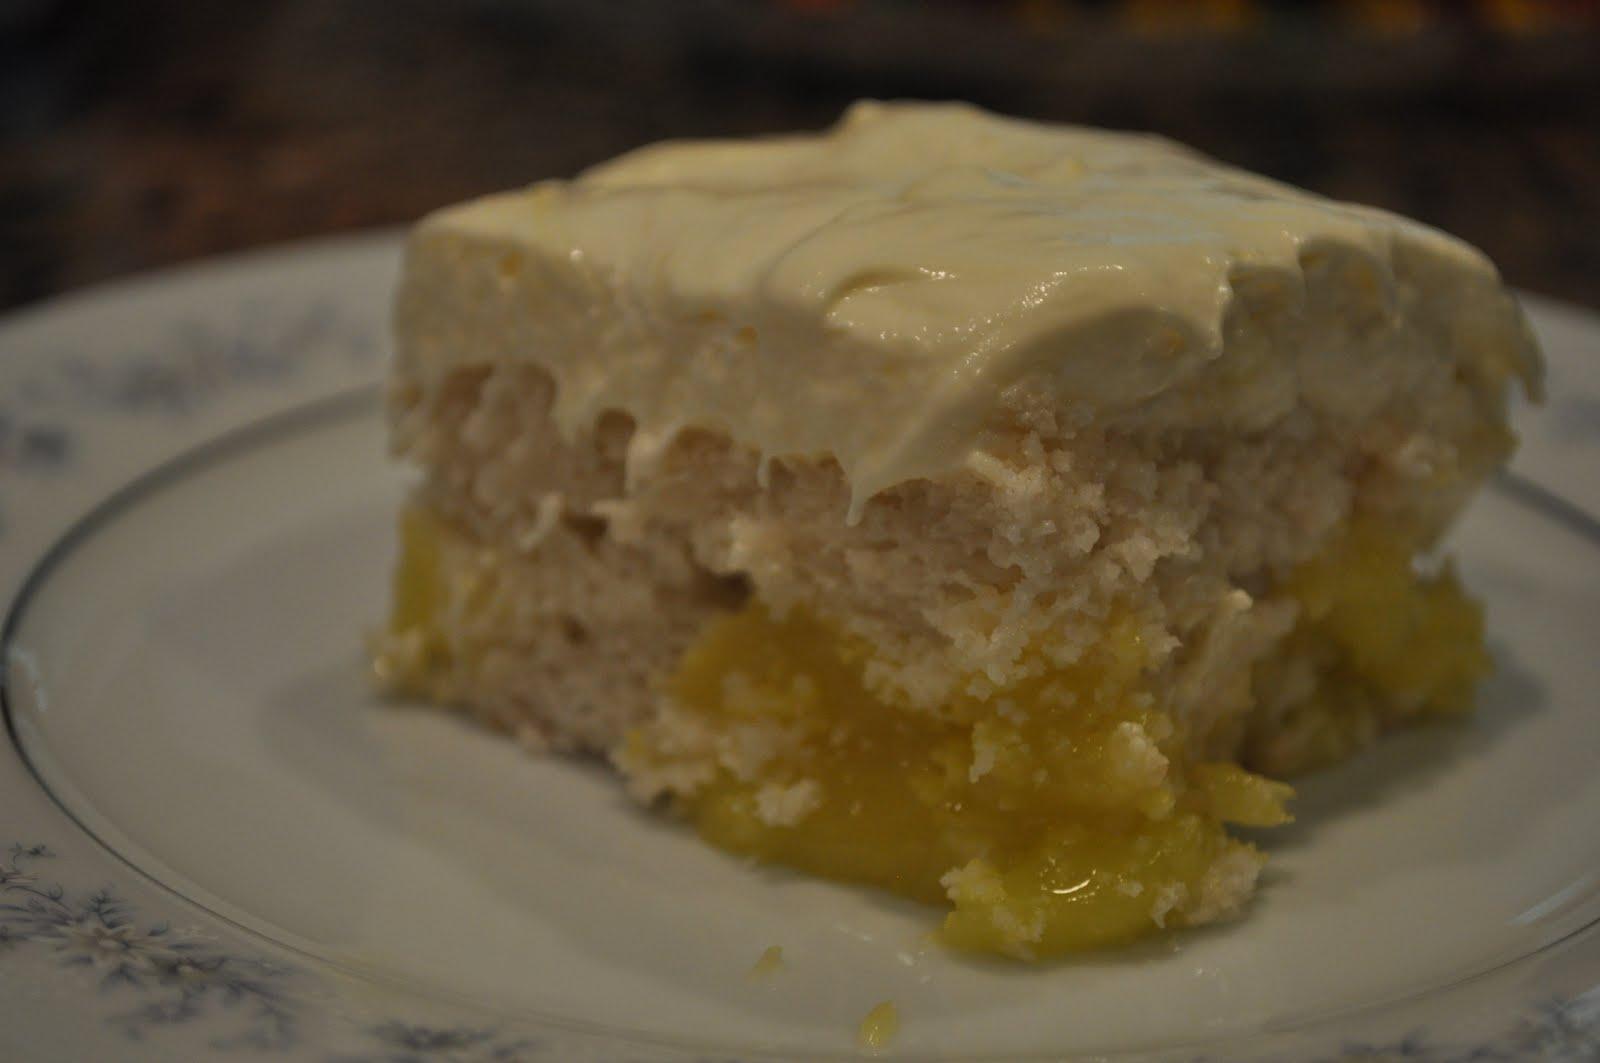 Lemon Cake Mix With Lemon Pie Filling